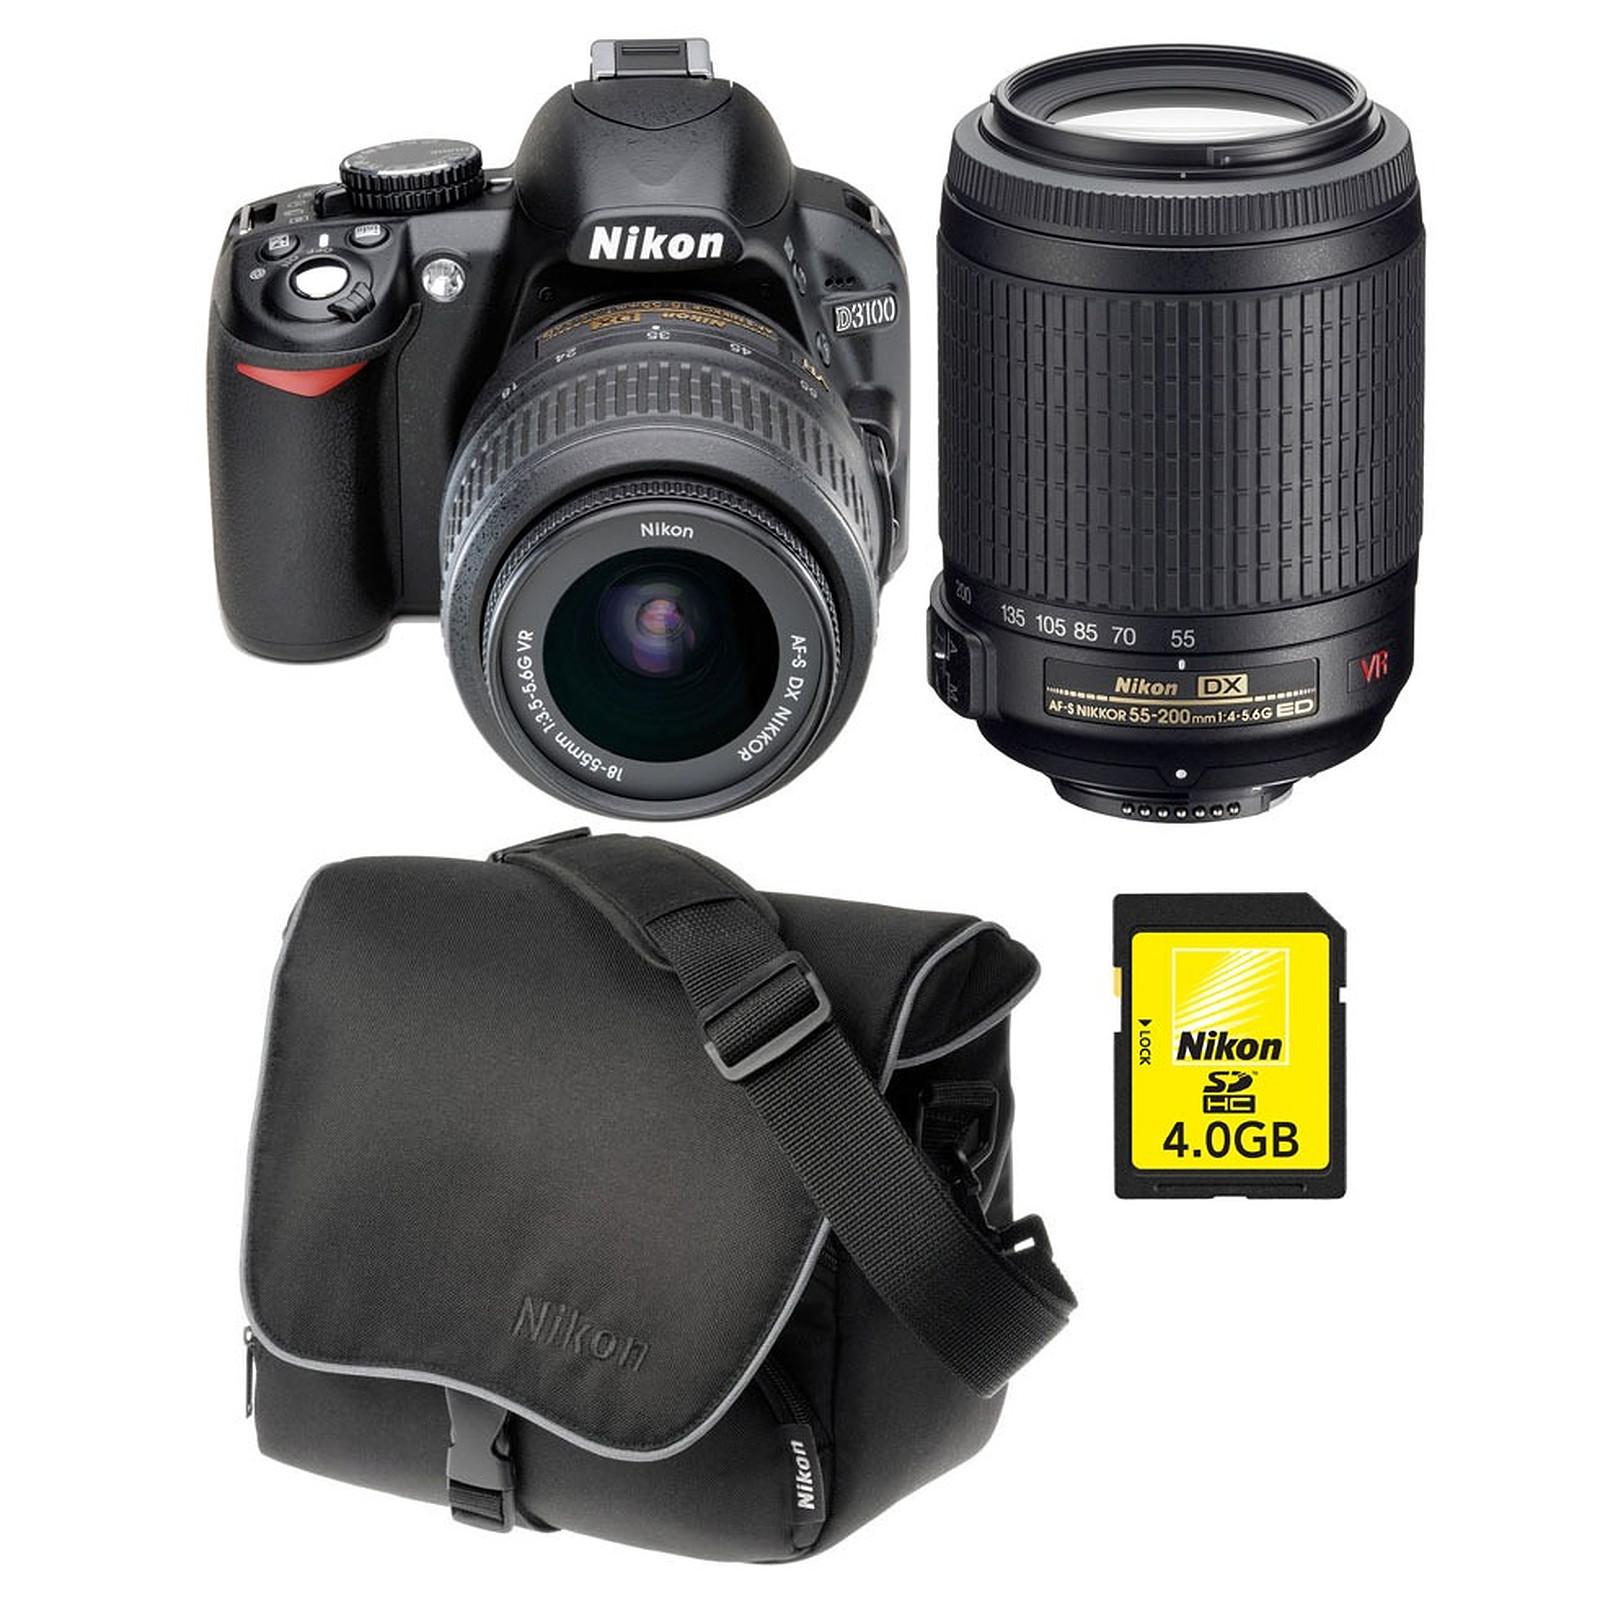 Nikon D3100 + 18-55 mm VR + 55-200 mm VR + Sacoche + Carte SDHC 4 Go